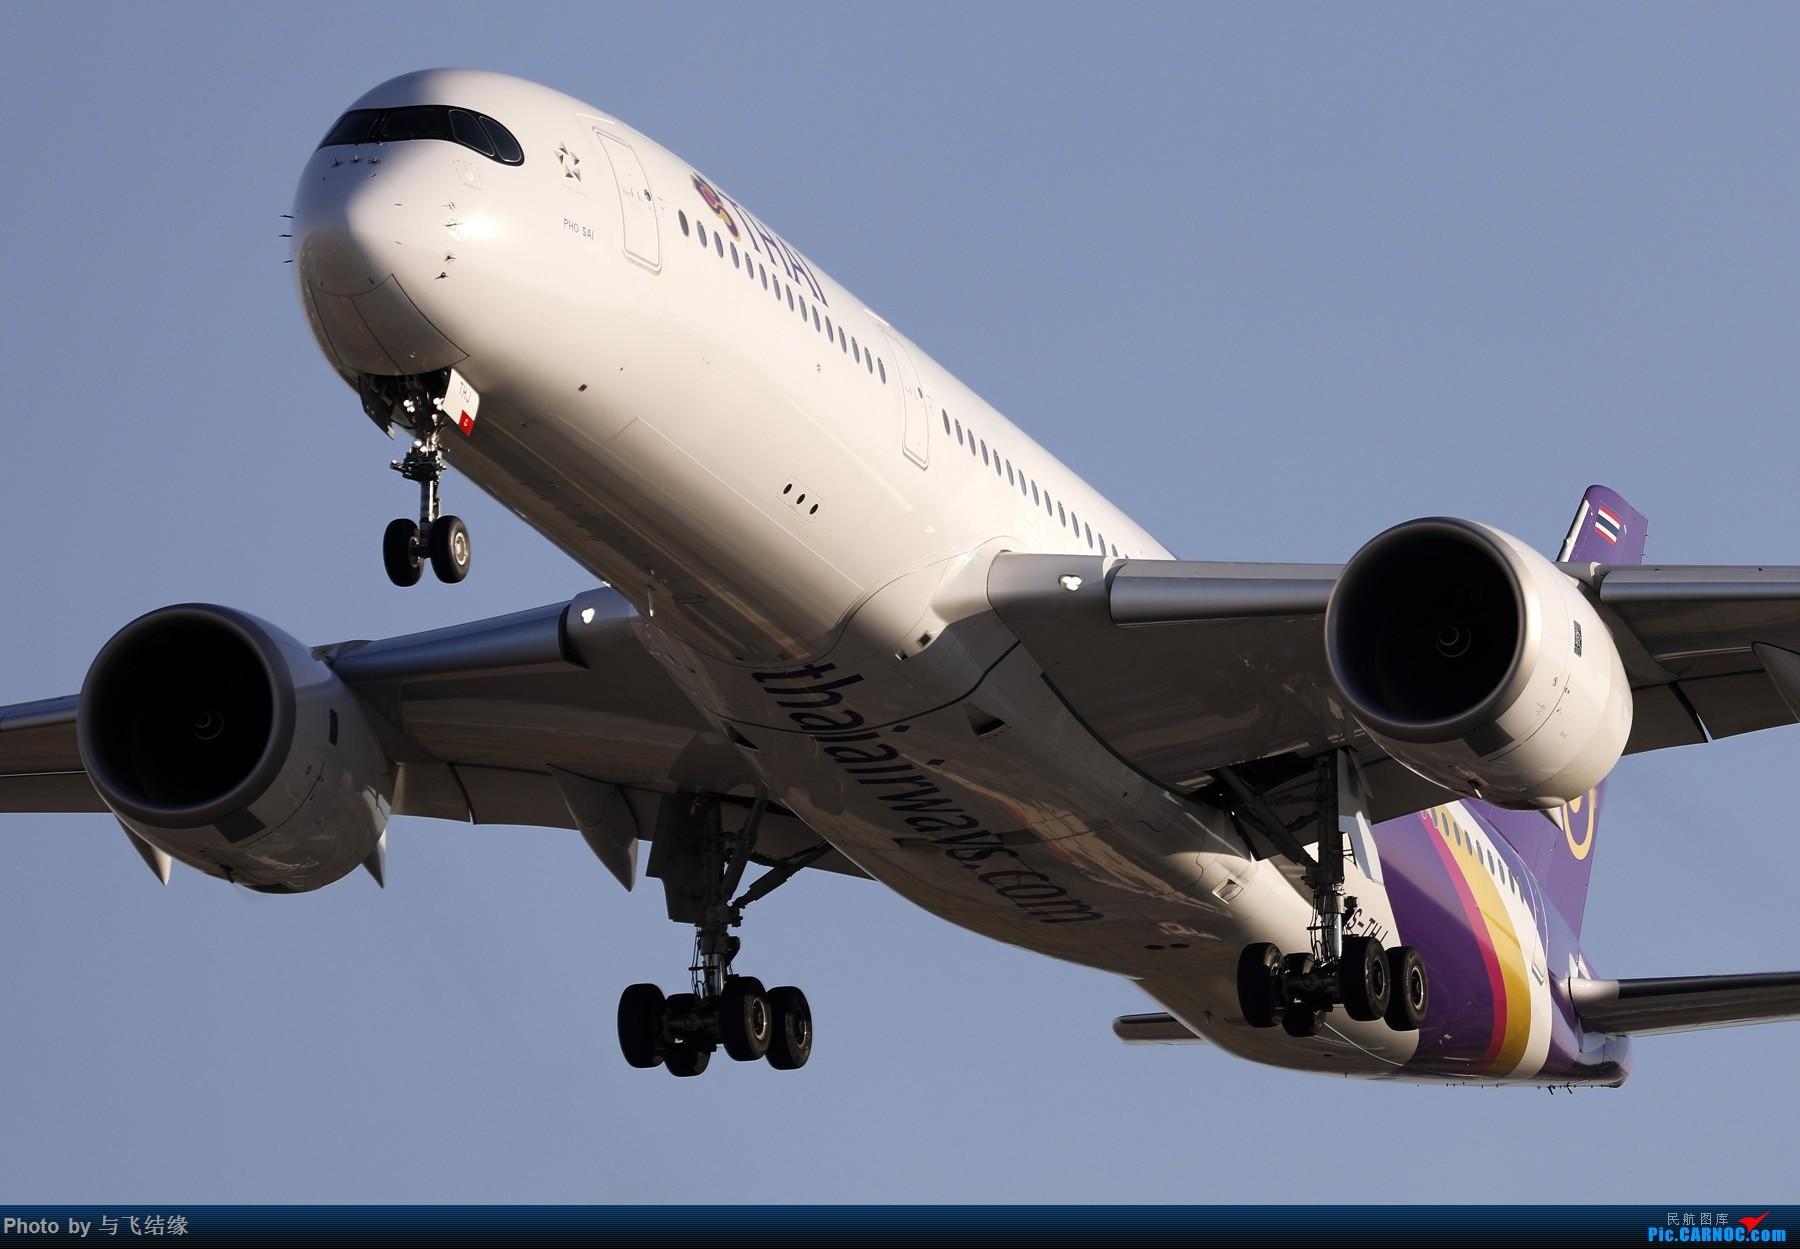 "Re:[原创]农历三十再发一贴,祝朋友们新年""猪""事顺利,吉祥如意! AIRBUS A350-900 HS-THJ 中国北京首都国际机场"